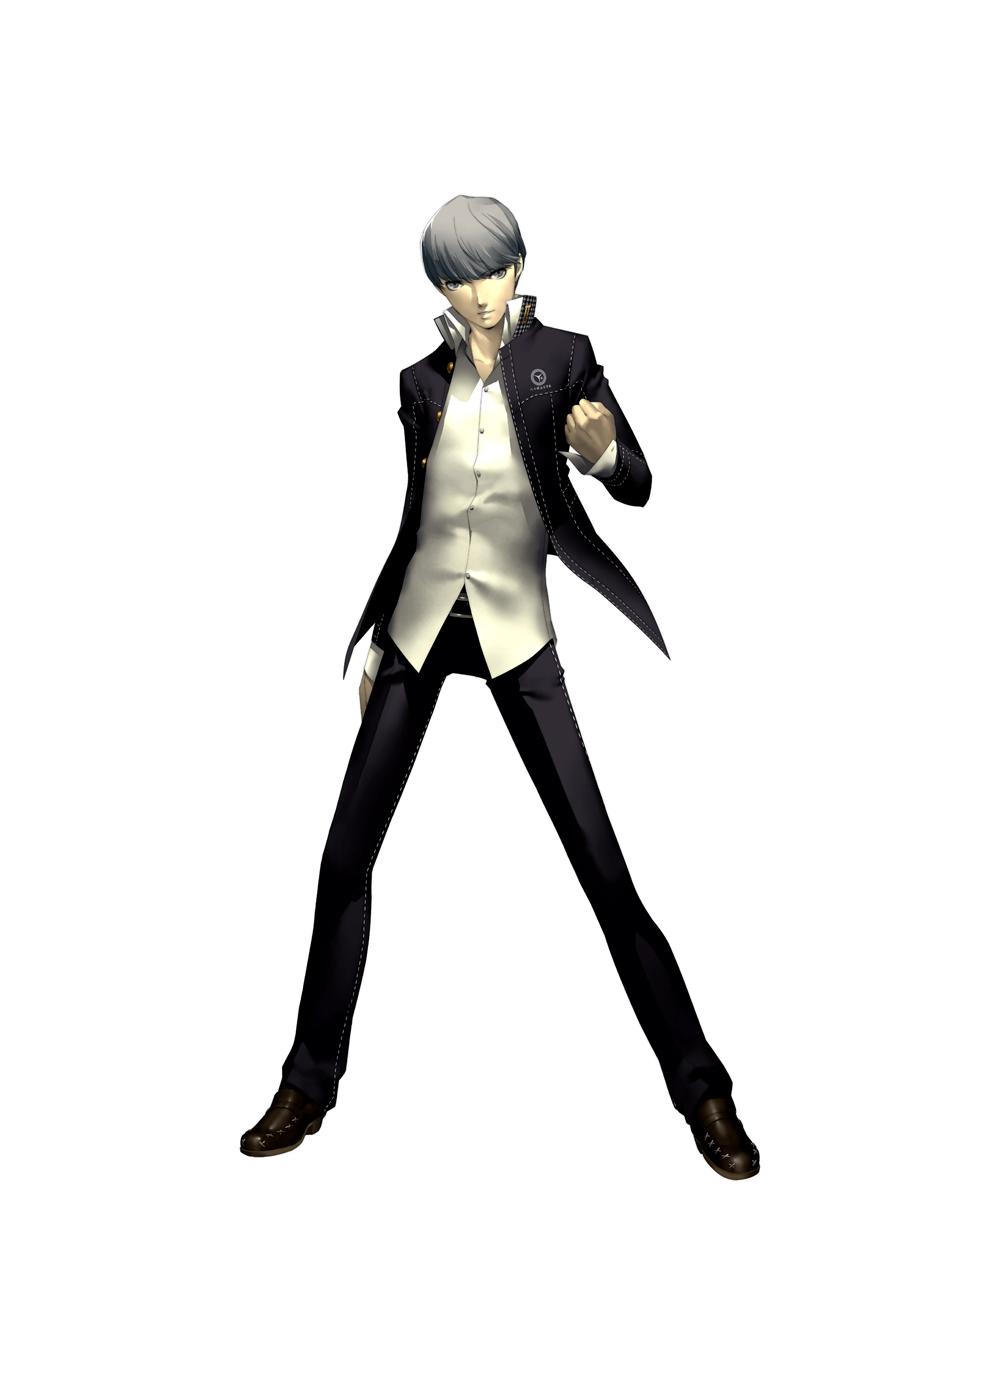 highres jacket male narukami_yuu official_art persona persona_4 seta_souji shigenori_soejima shirt short_hair silver_hair soejima_shigenori